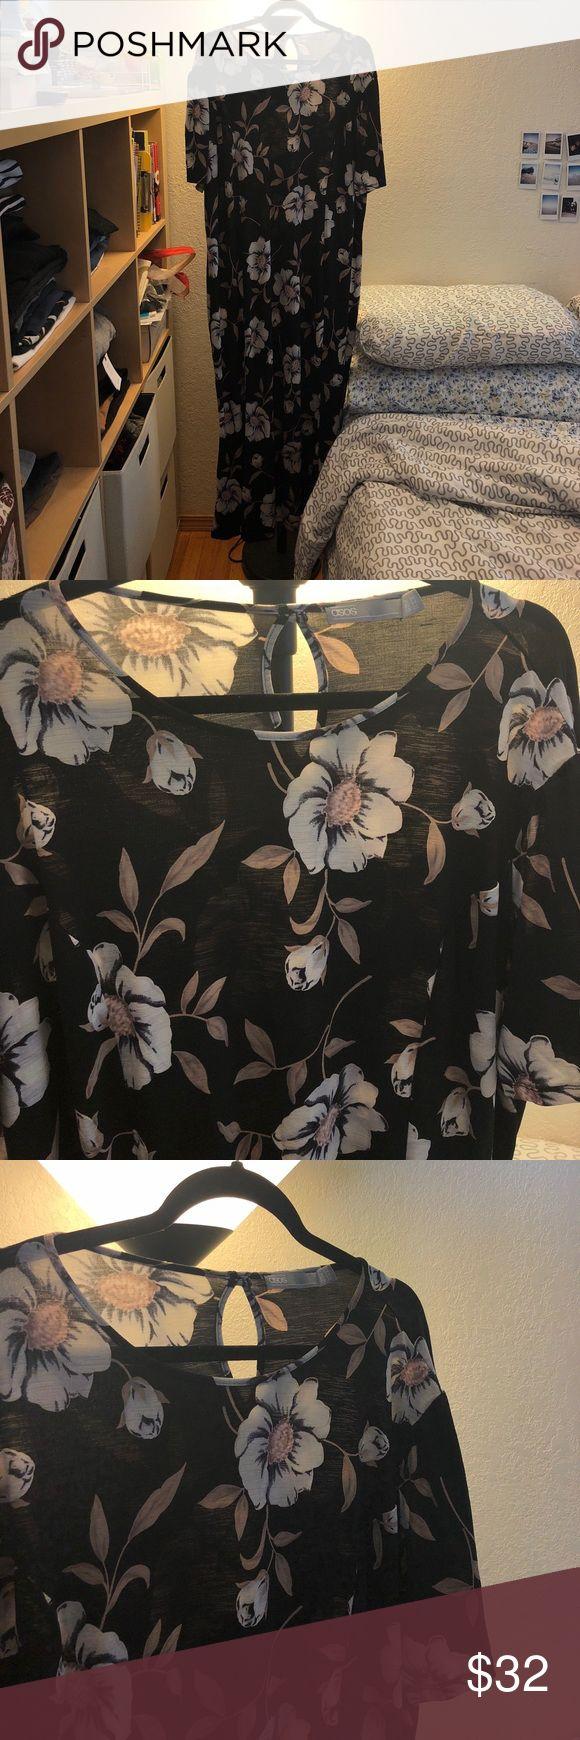 ASOS Curve Maxi Tea Dress In Large Flower Print Worn 2-3 times. Excellent condition. SEND ME AN OFFER. 🙂 ASOS Curve Dresses Maxi